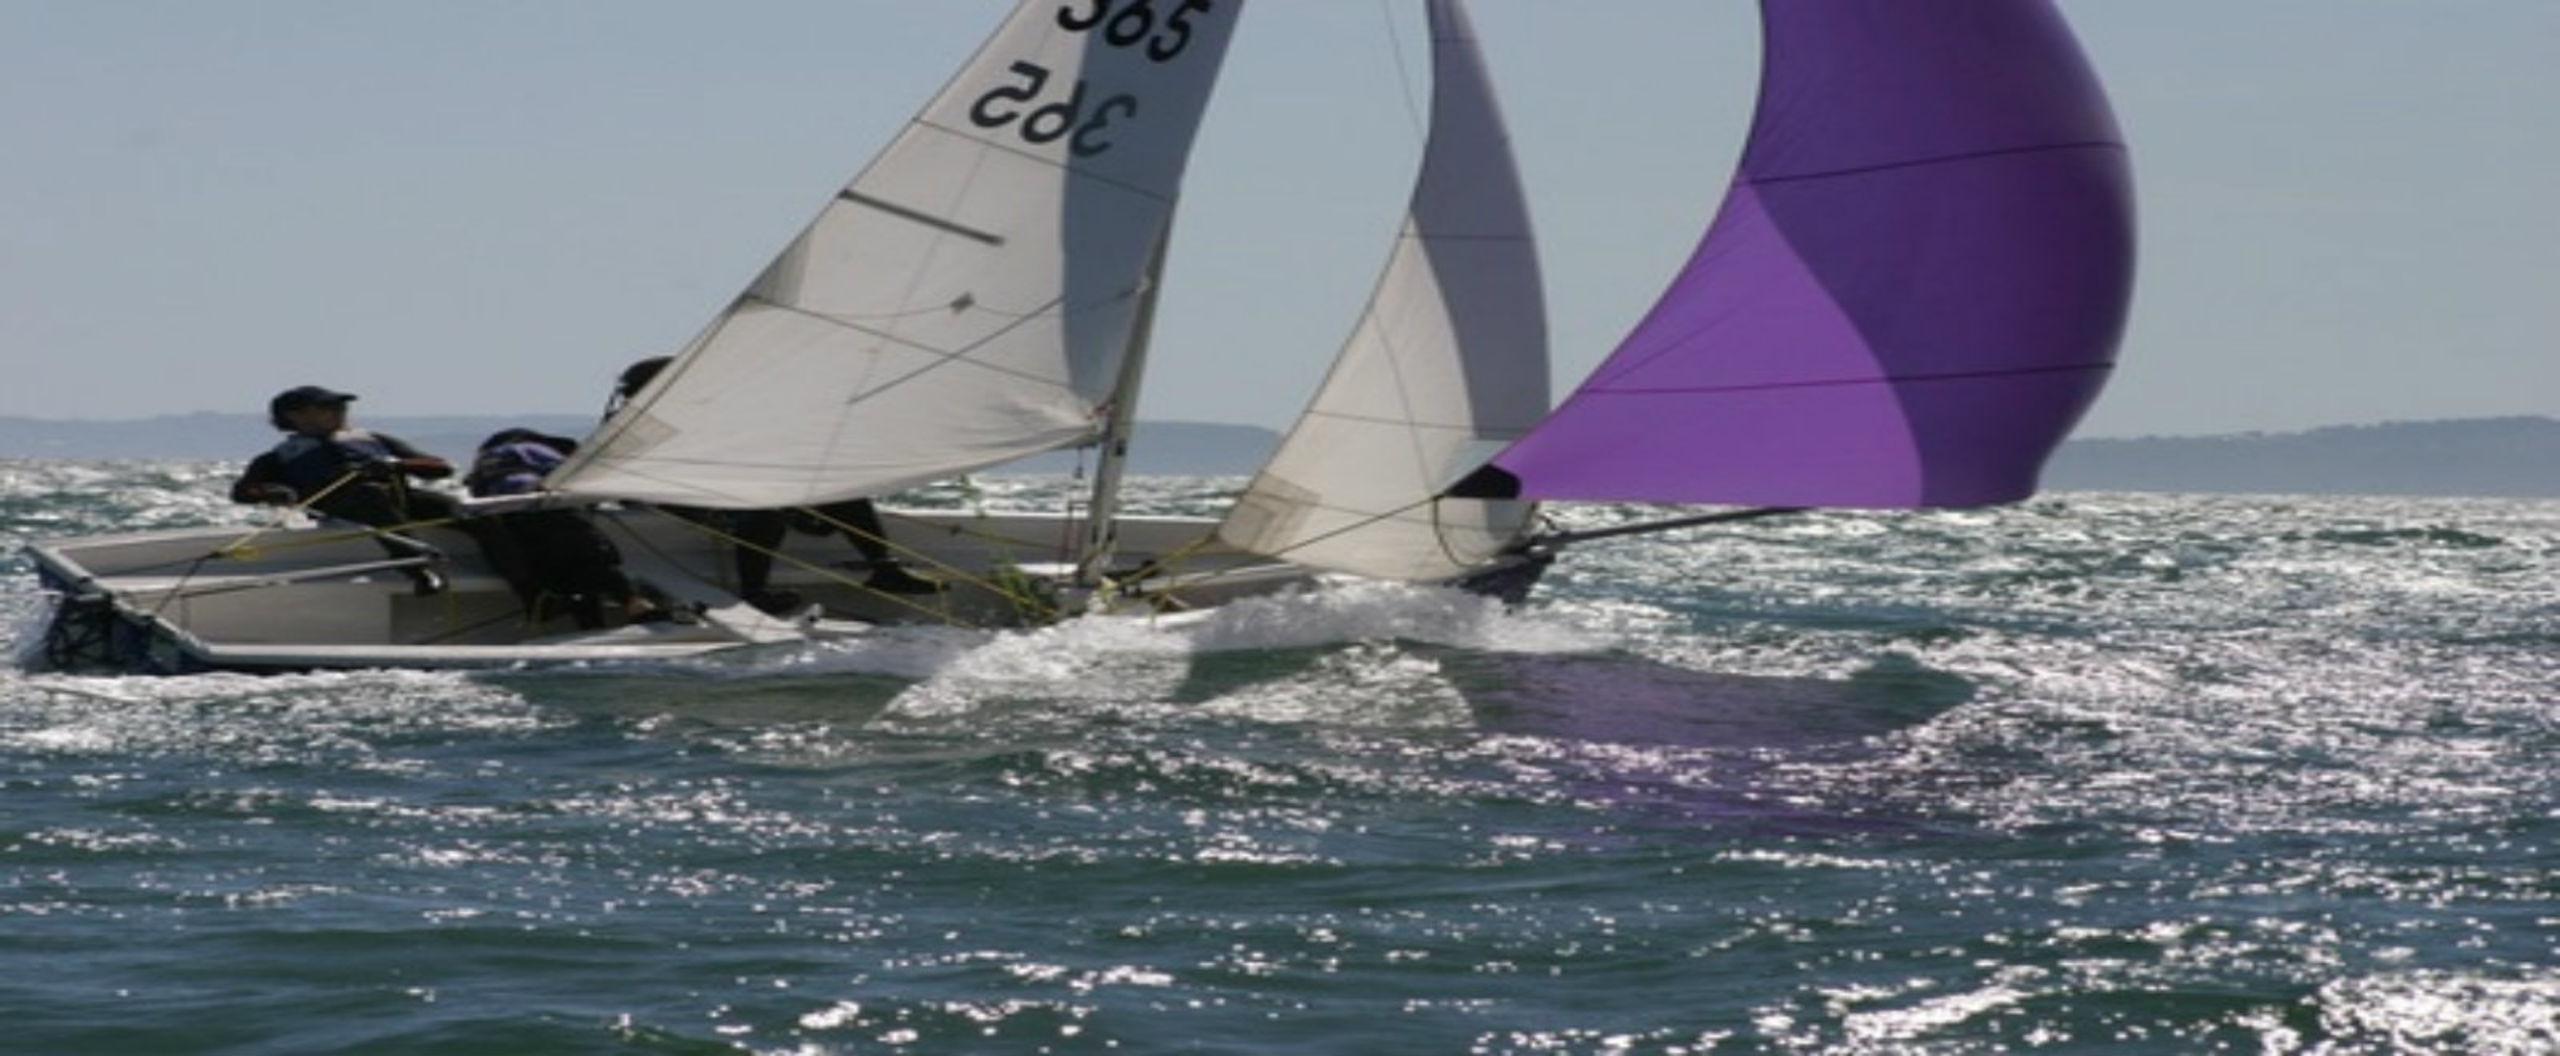 Charlotte Harbor World Class Sailing Destination